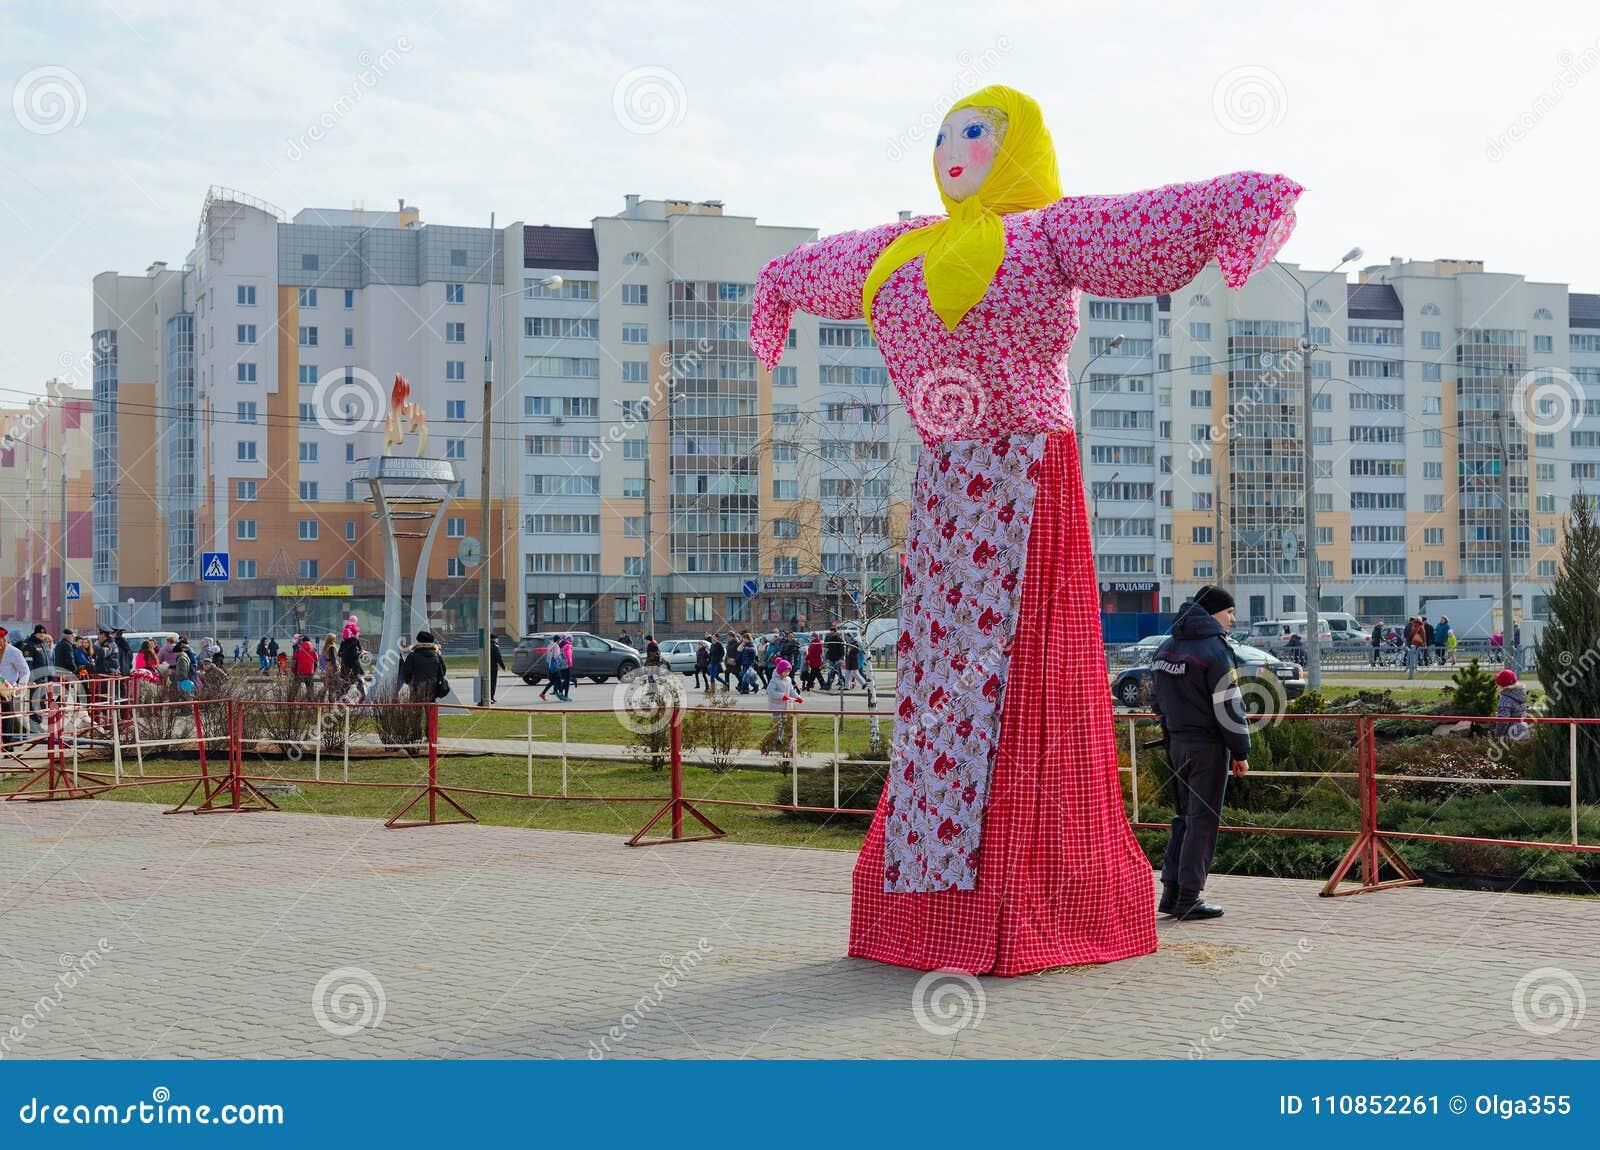 scarecrow of shrovetide on city street during shrovetide festivities